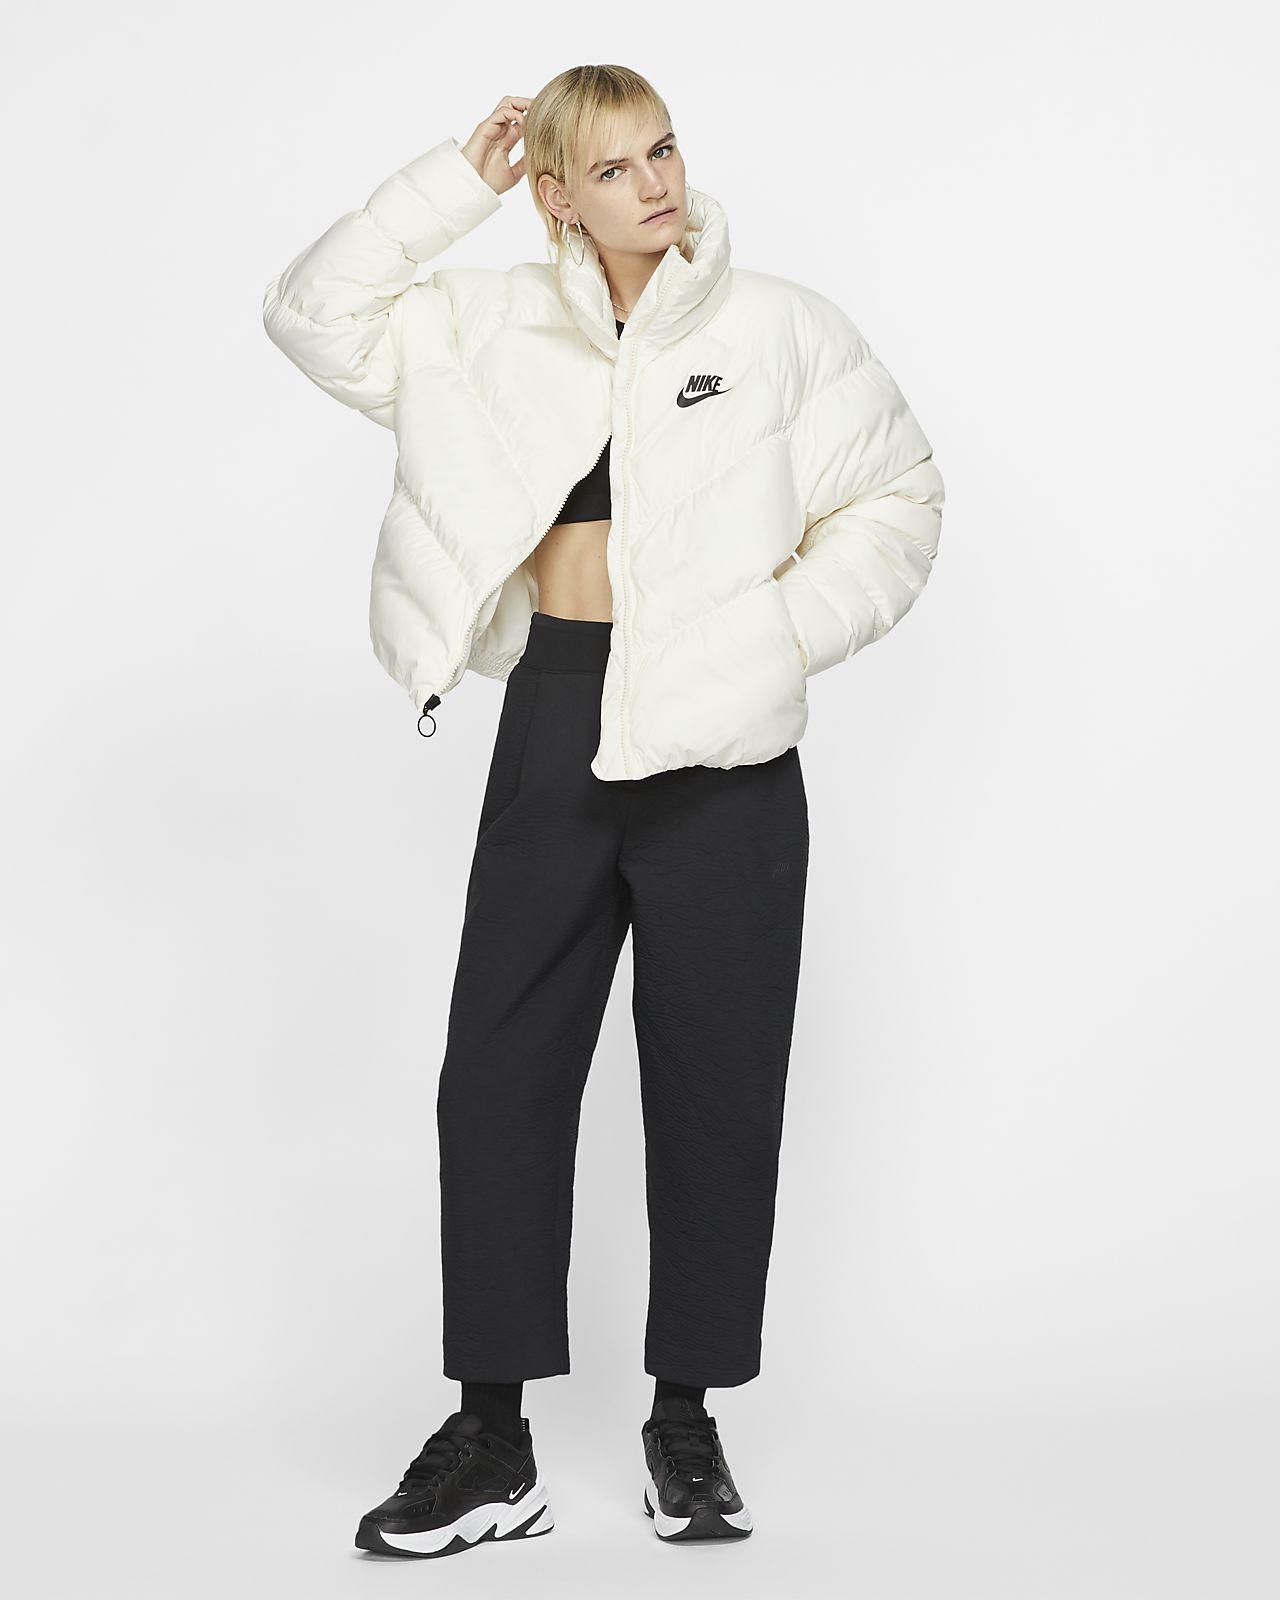 pour Sportswear Synthetic Femme Nike Veste Fill m8nNOv0wPy